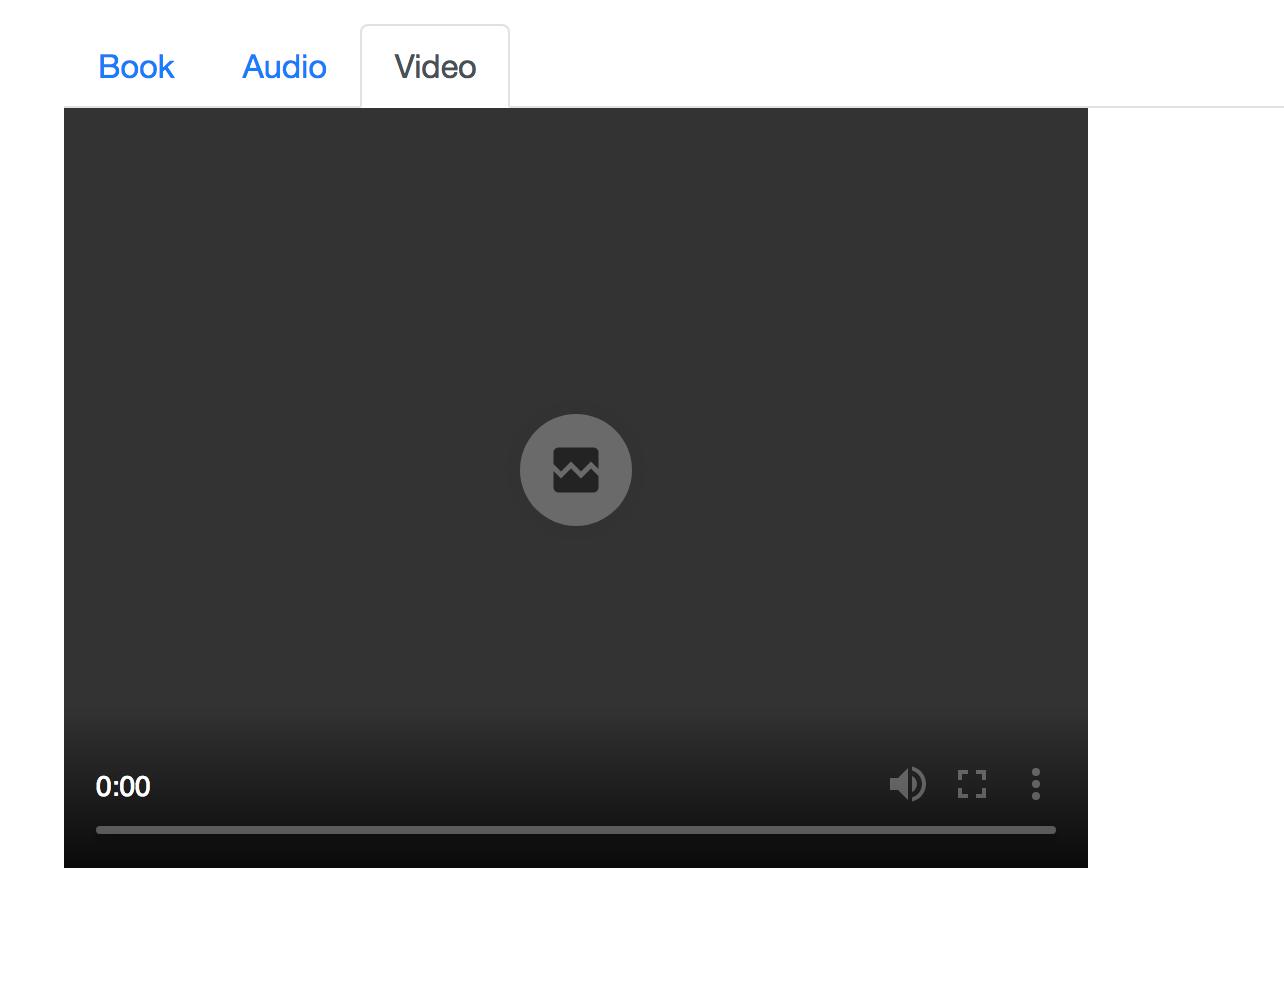 S3 Video Streaming Error